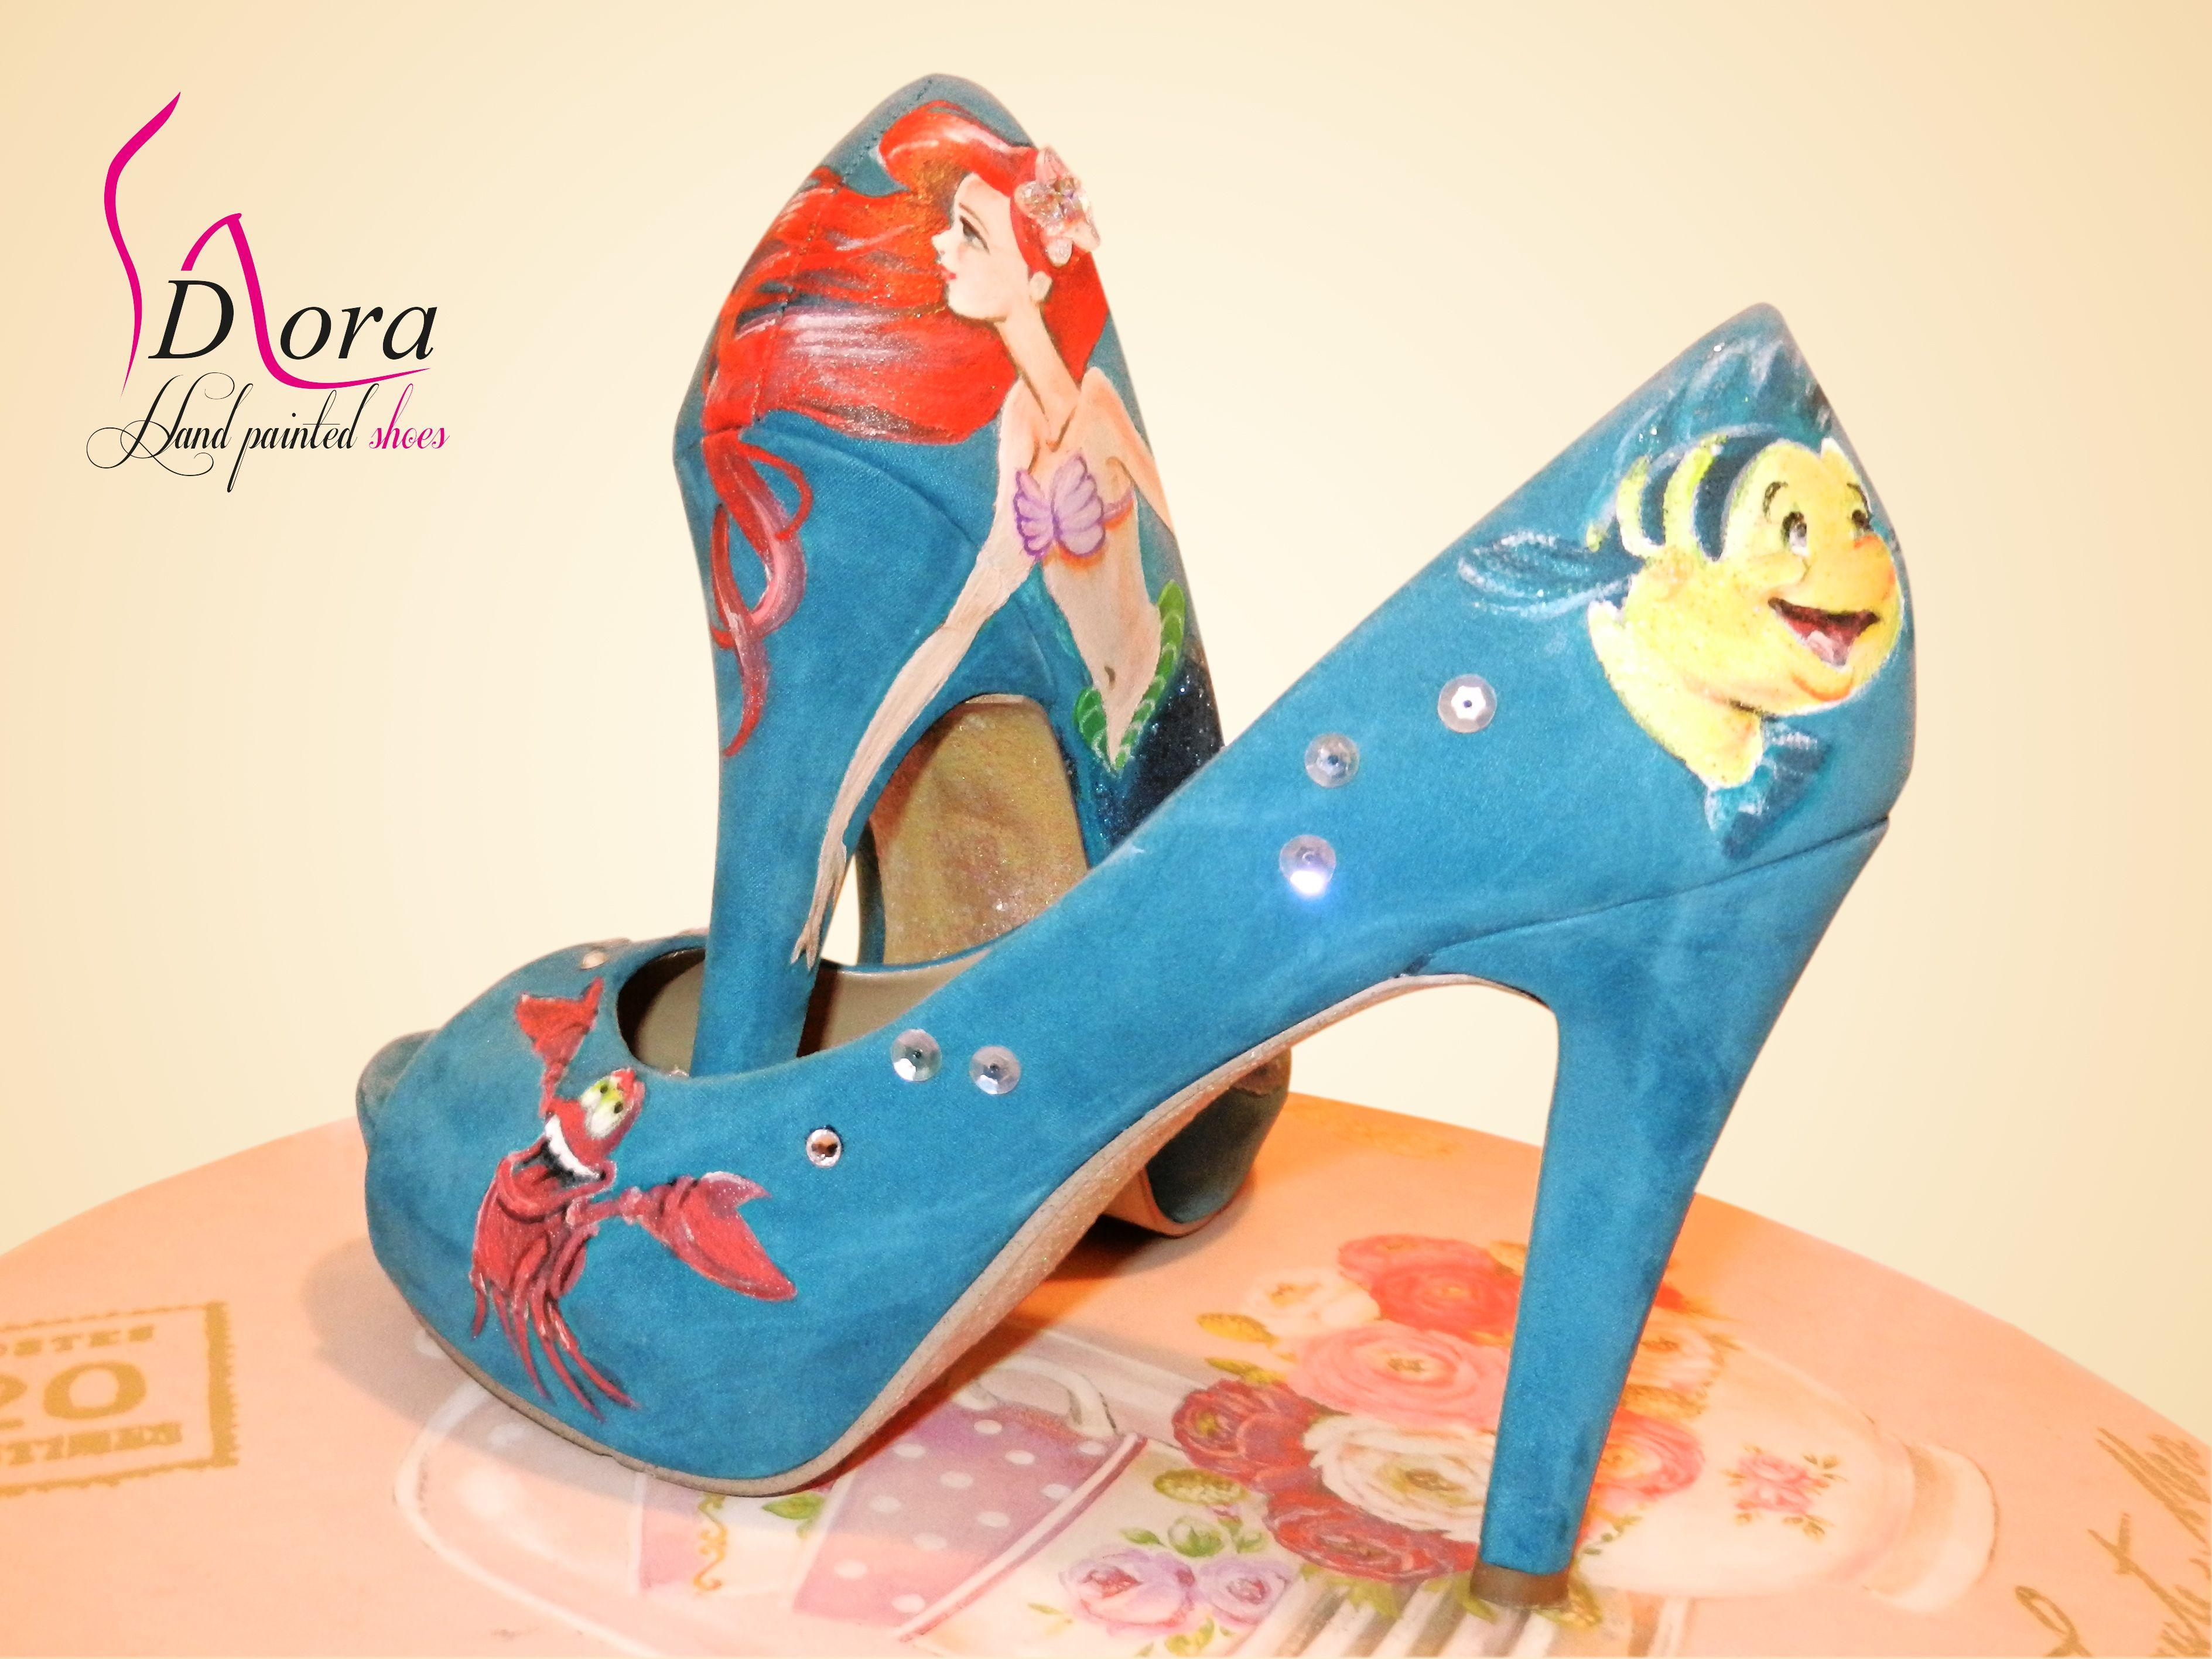 https://www.facebook.com/pages/DORA-Hand-Painted-Shoes/144006675801939  #handpainted  #hand #painted #shoes #little #mermaid #ariel #scarpe #dipinte #mano #sirenetta #flounder #sebastian #art #fashion #hight #heels